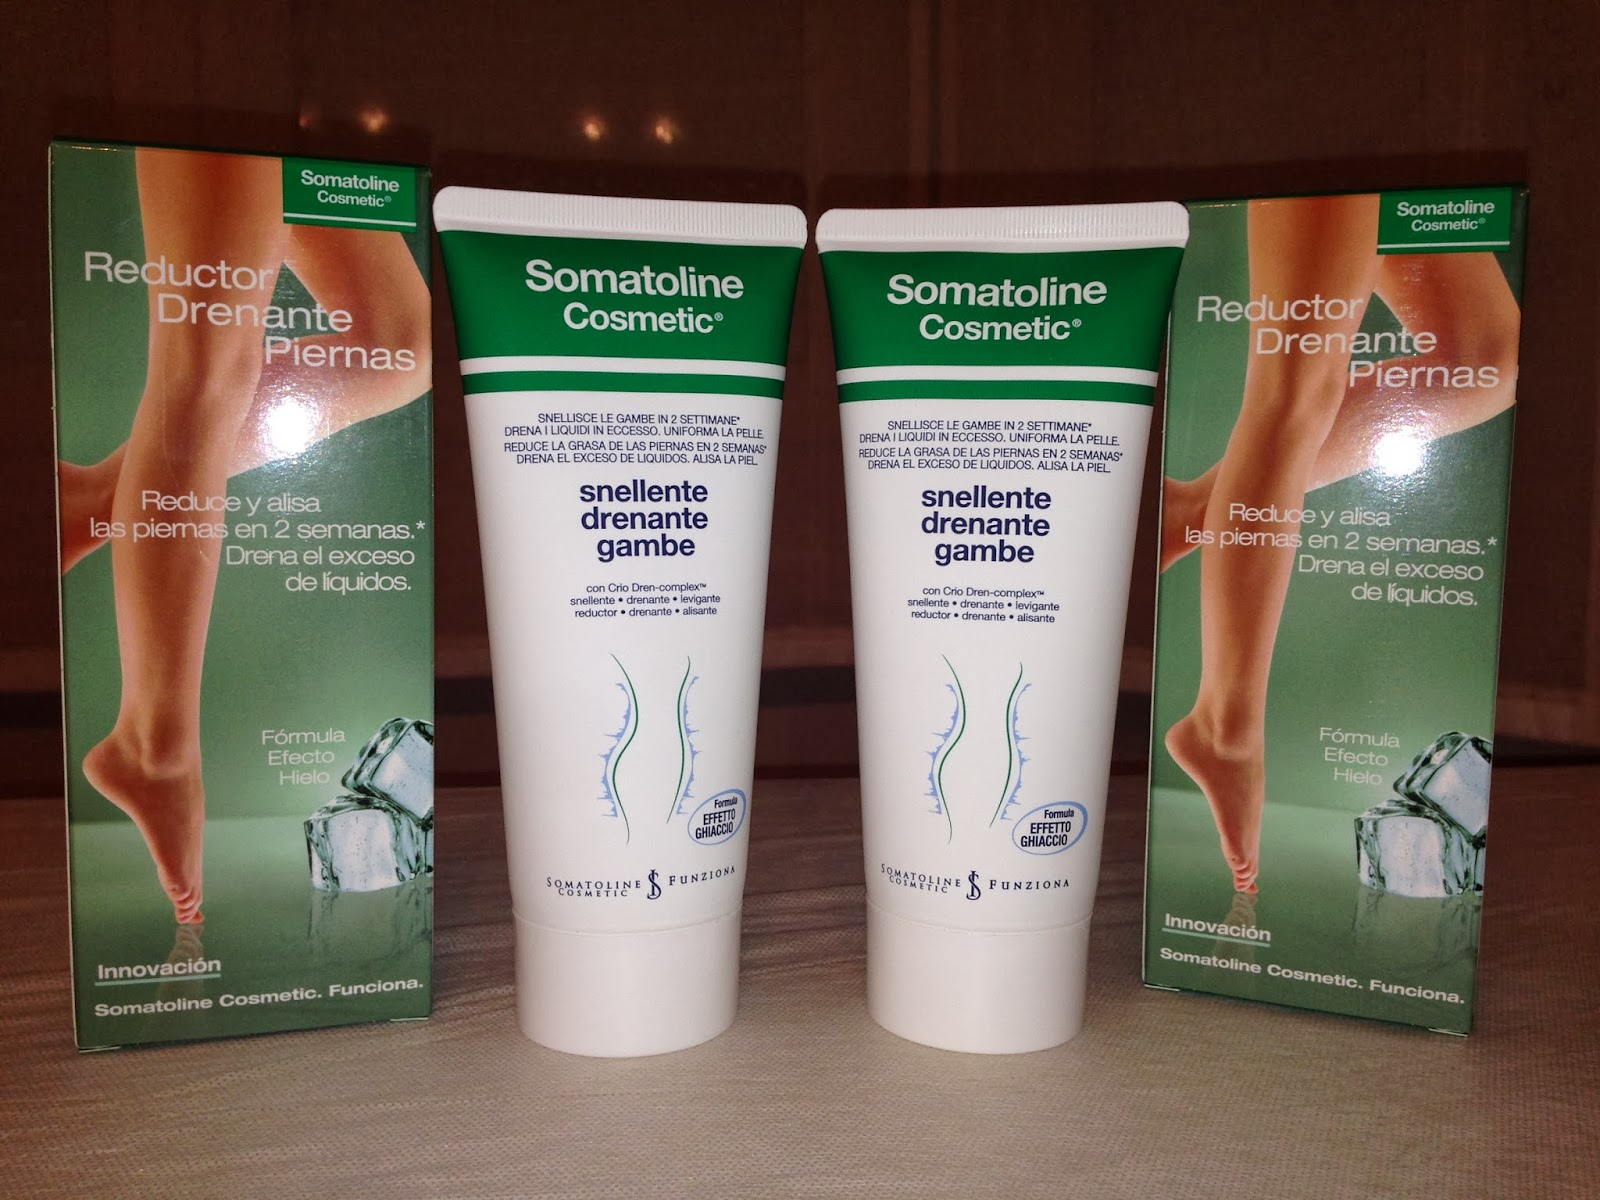 Reduce y drena tus piernas con Somatoline Cosmetic...